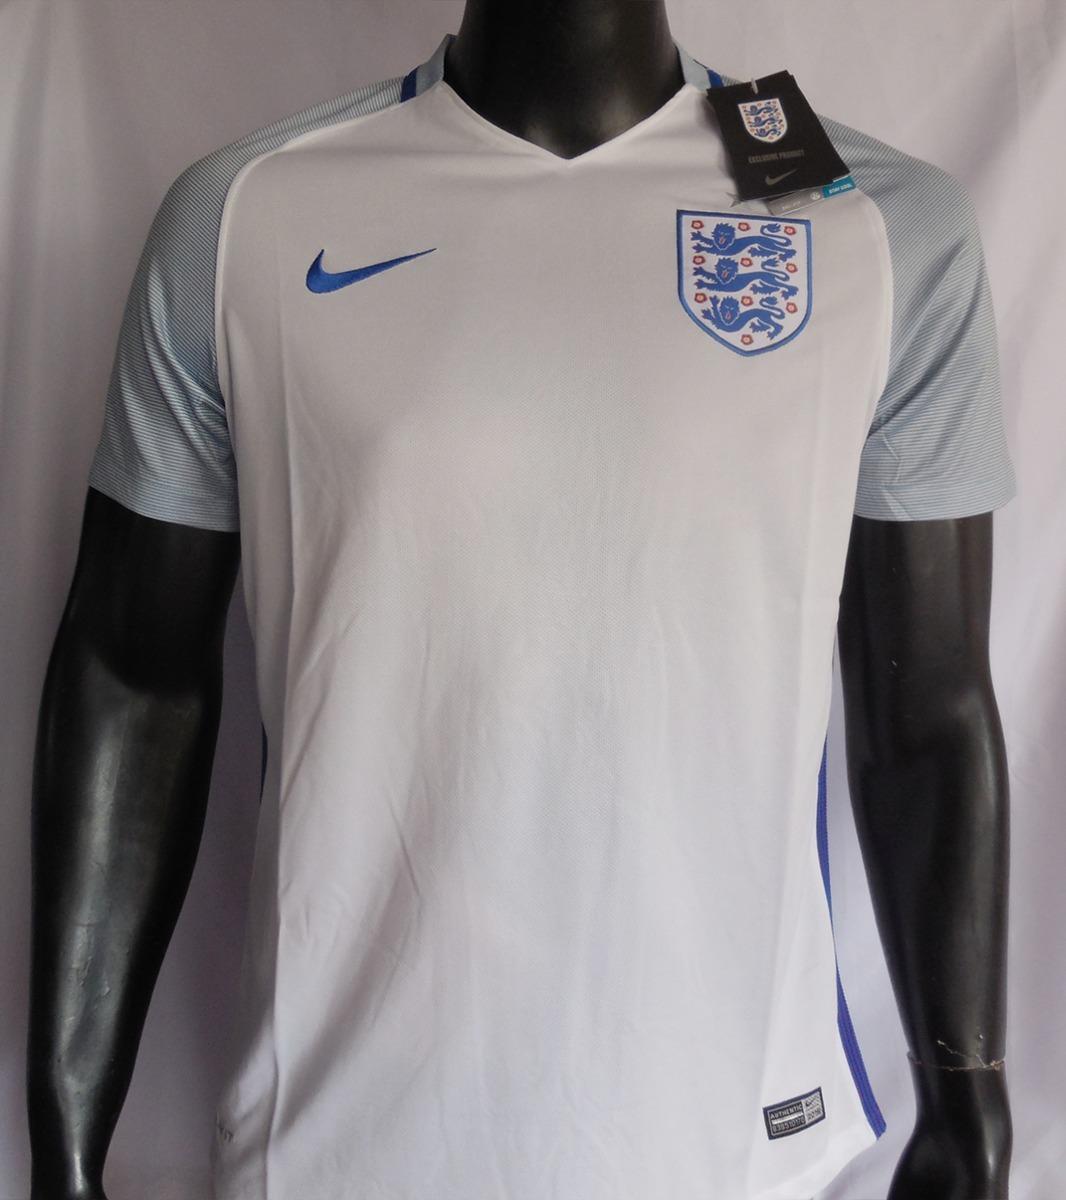 camiseta inglaterra eurocopa 2016 local nike. Cargando zoom. c8ab42c5dff3b